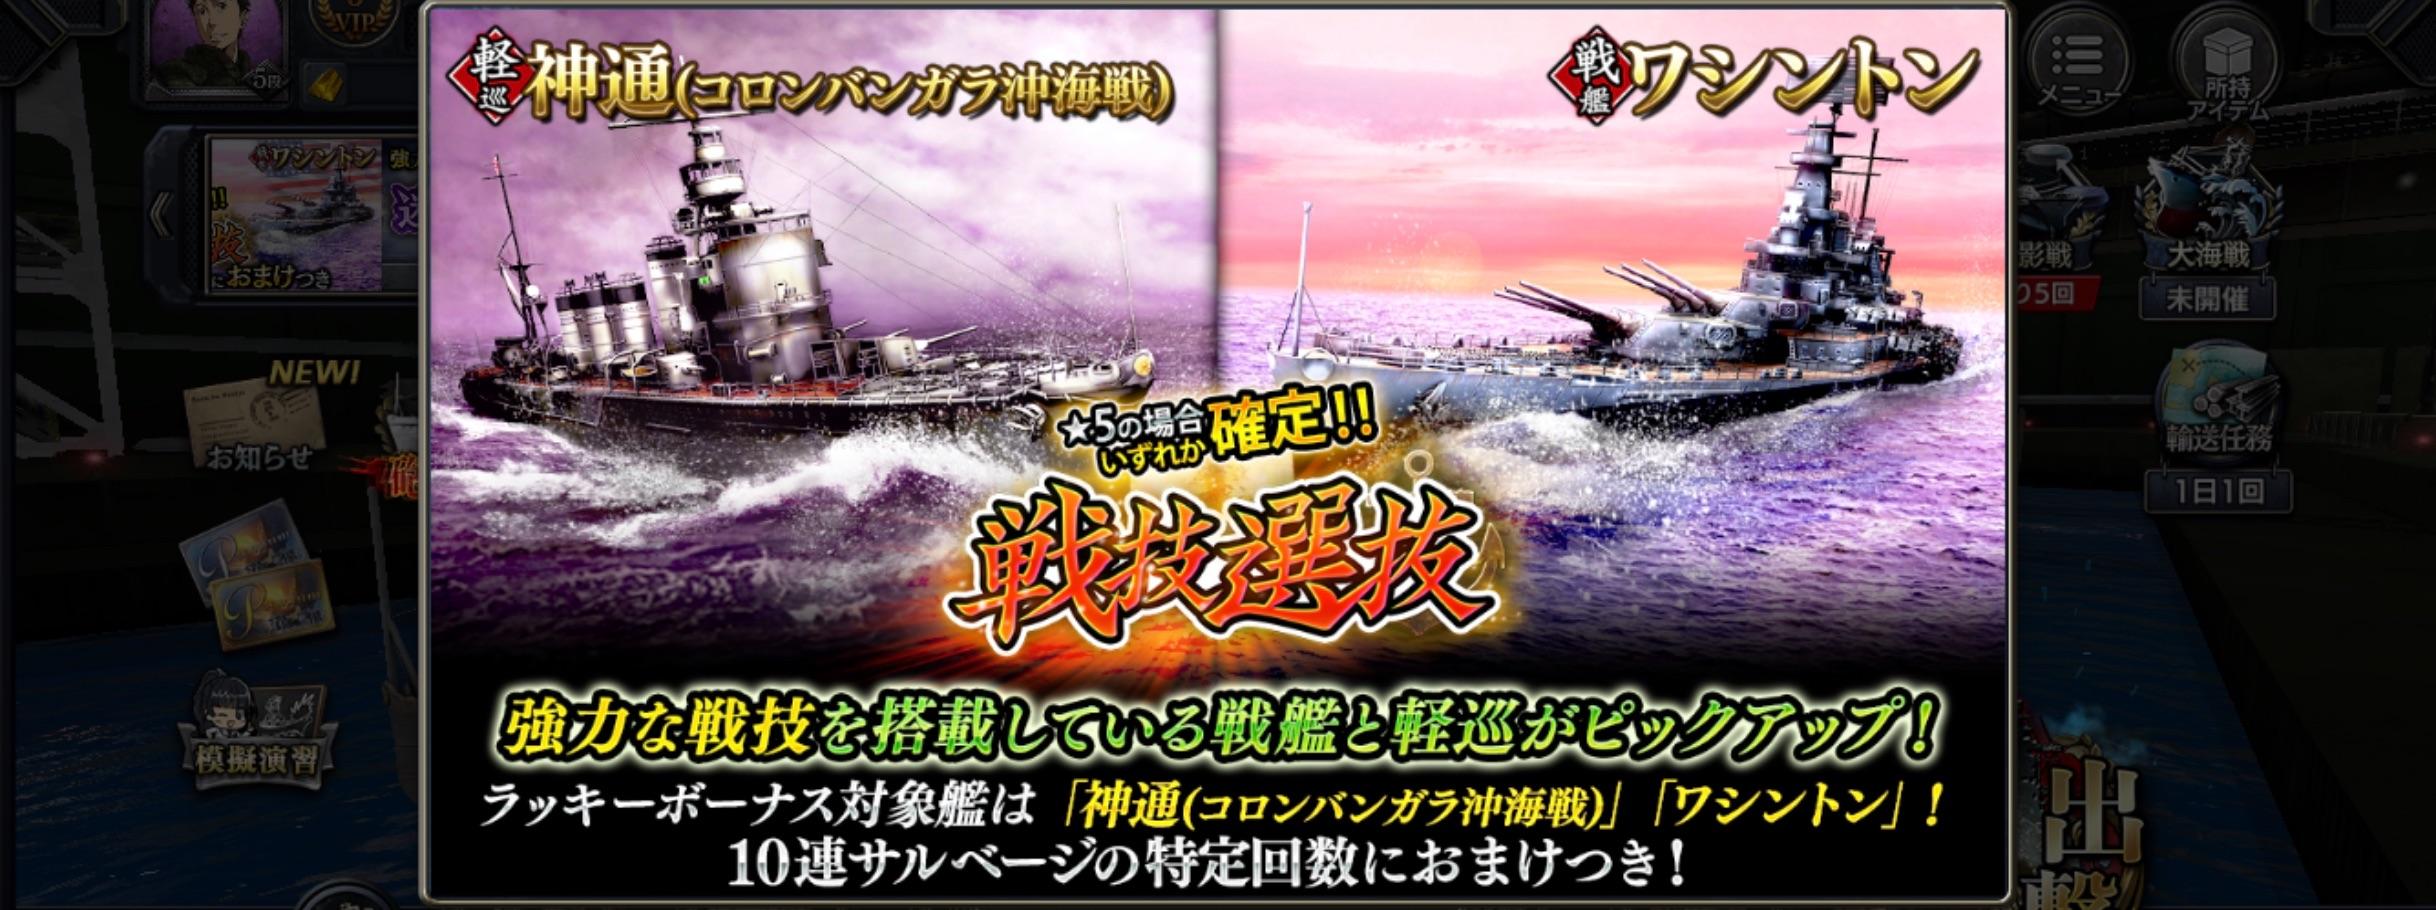 battleship-Washington